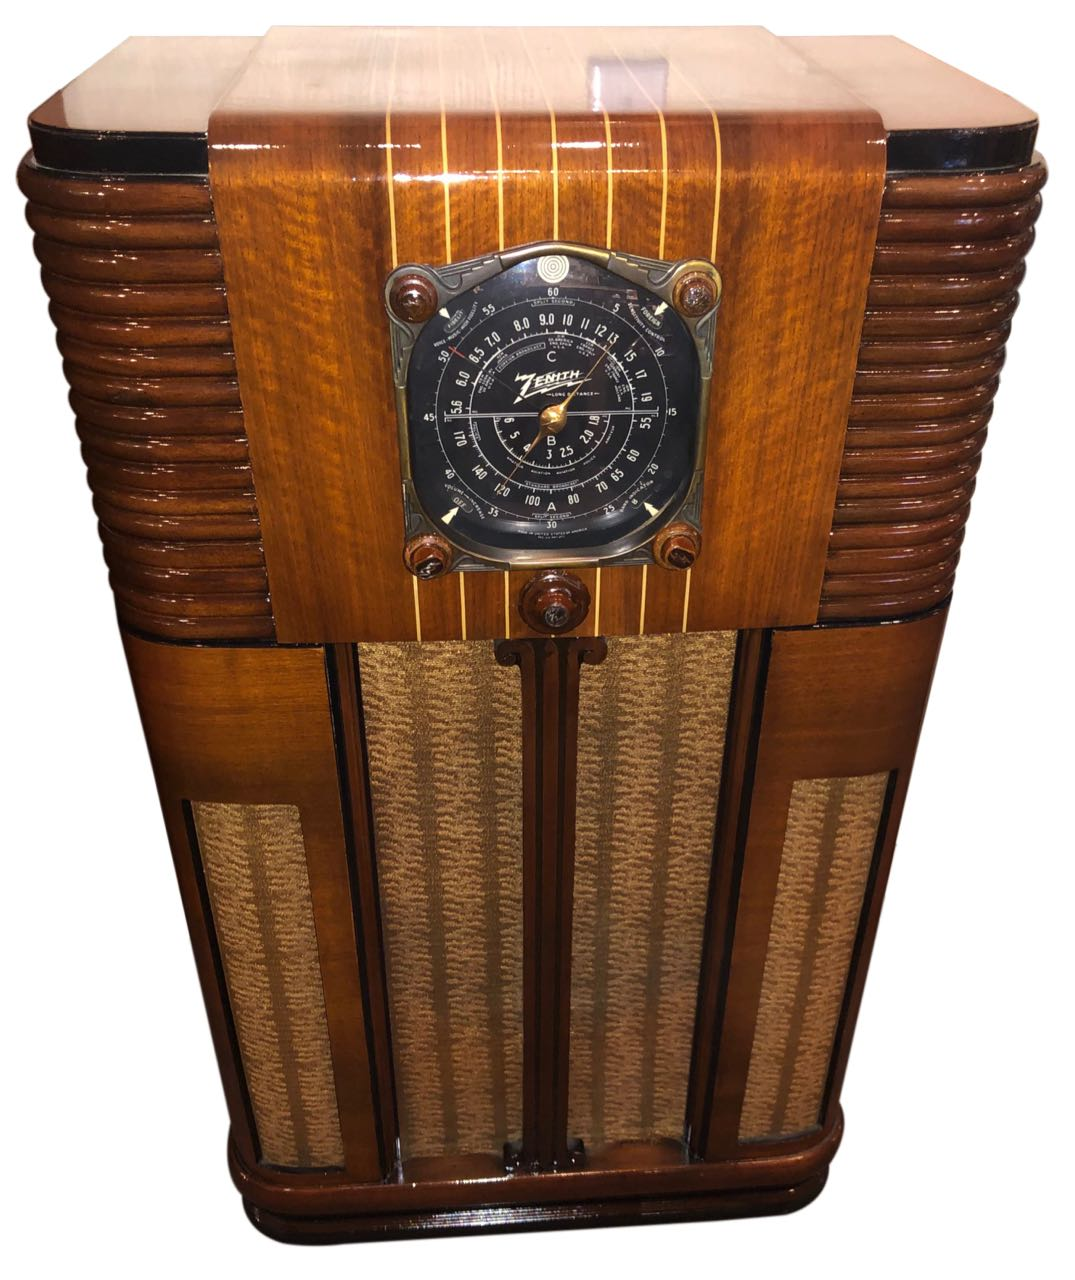 Zenith 10-S-160 Console (1937) Restored Radio Bluetooth